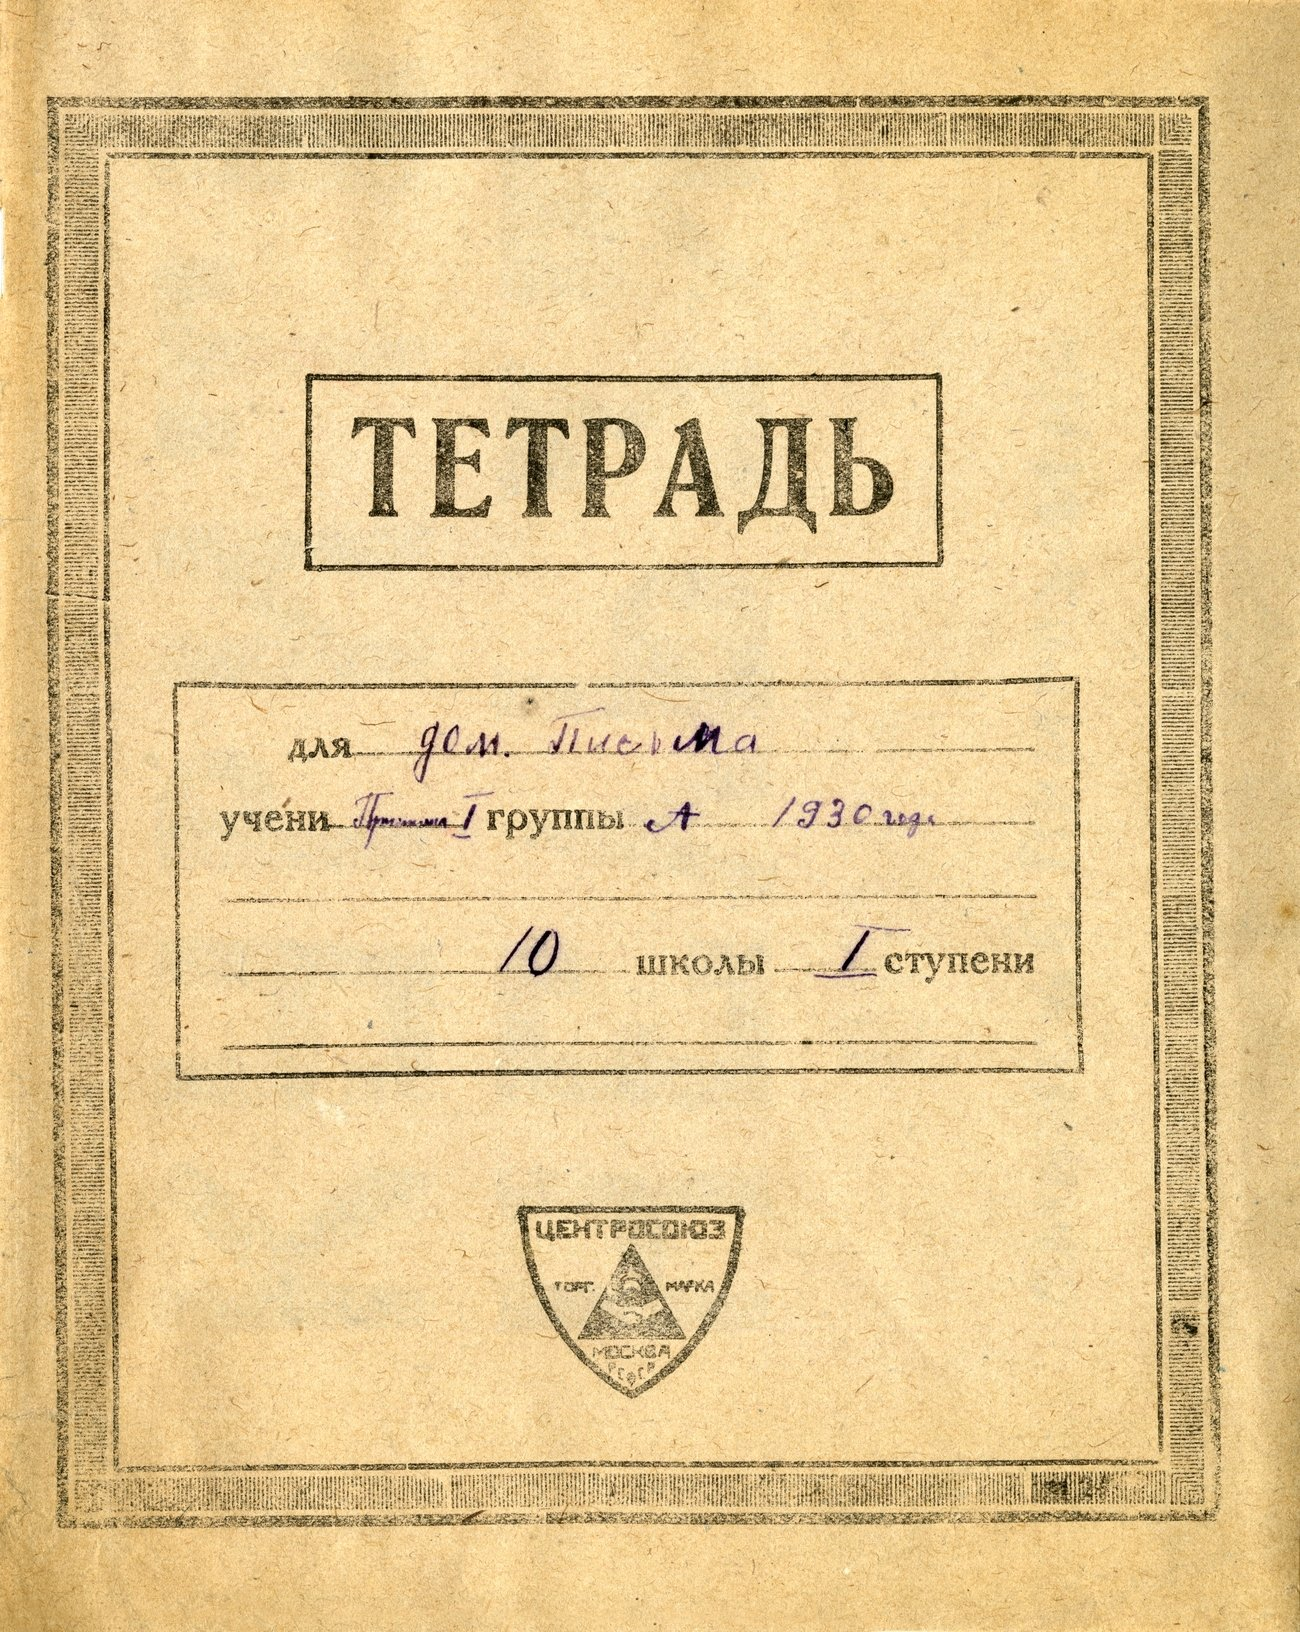 Тетрадь 1930 Центросоюз